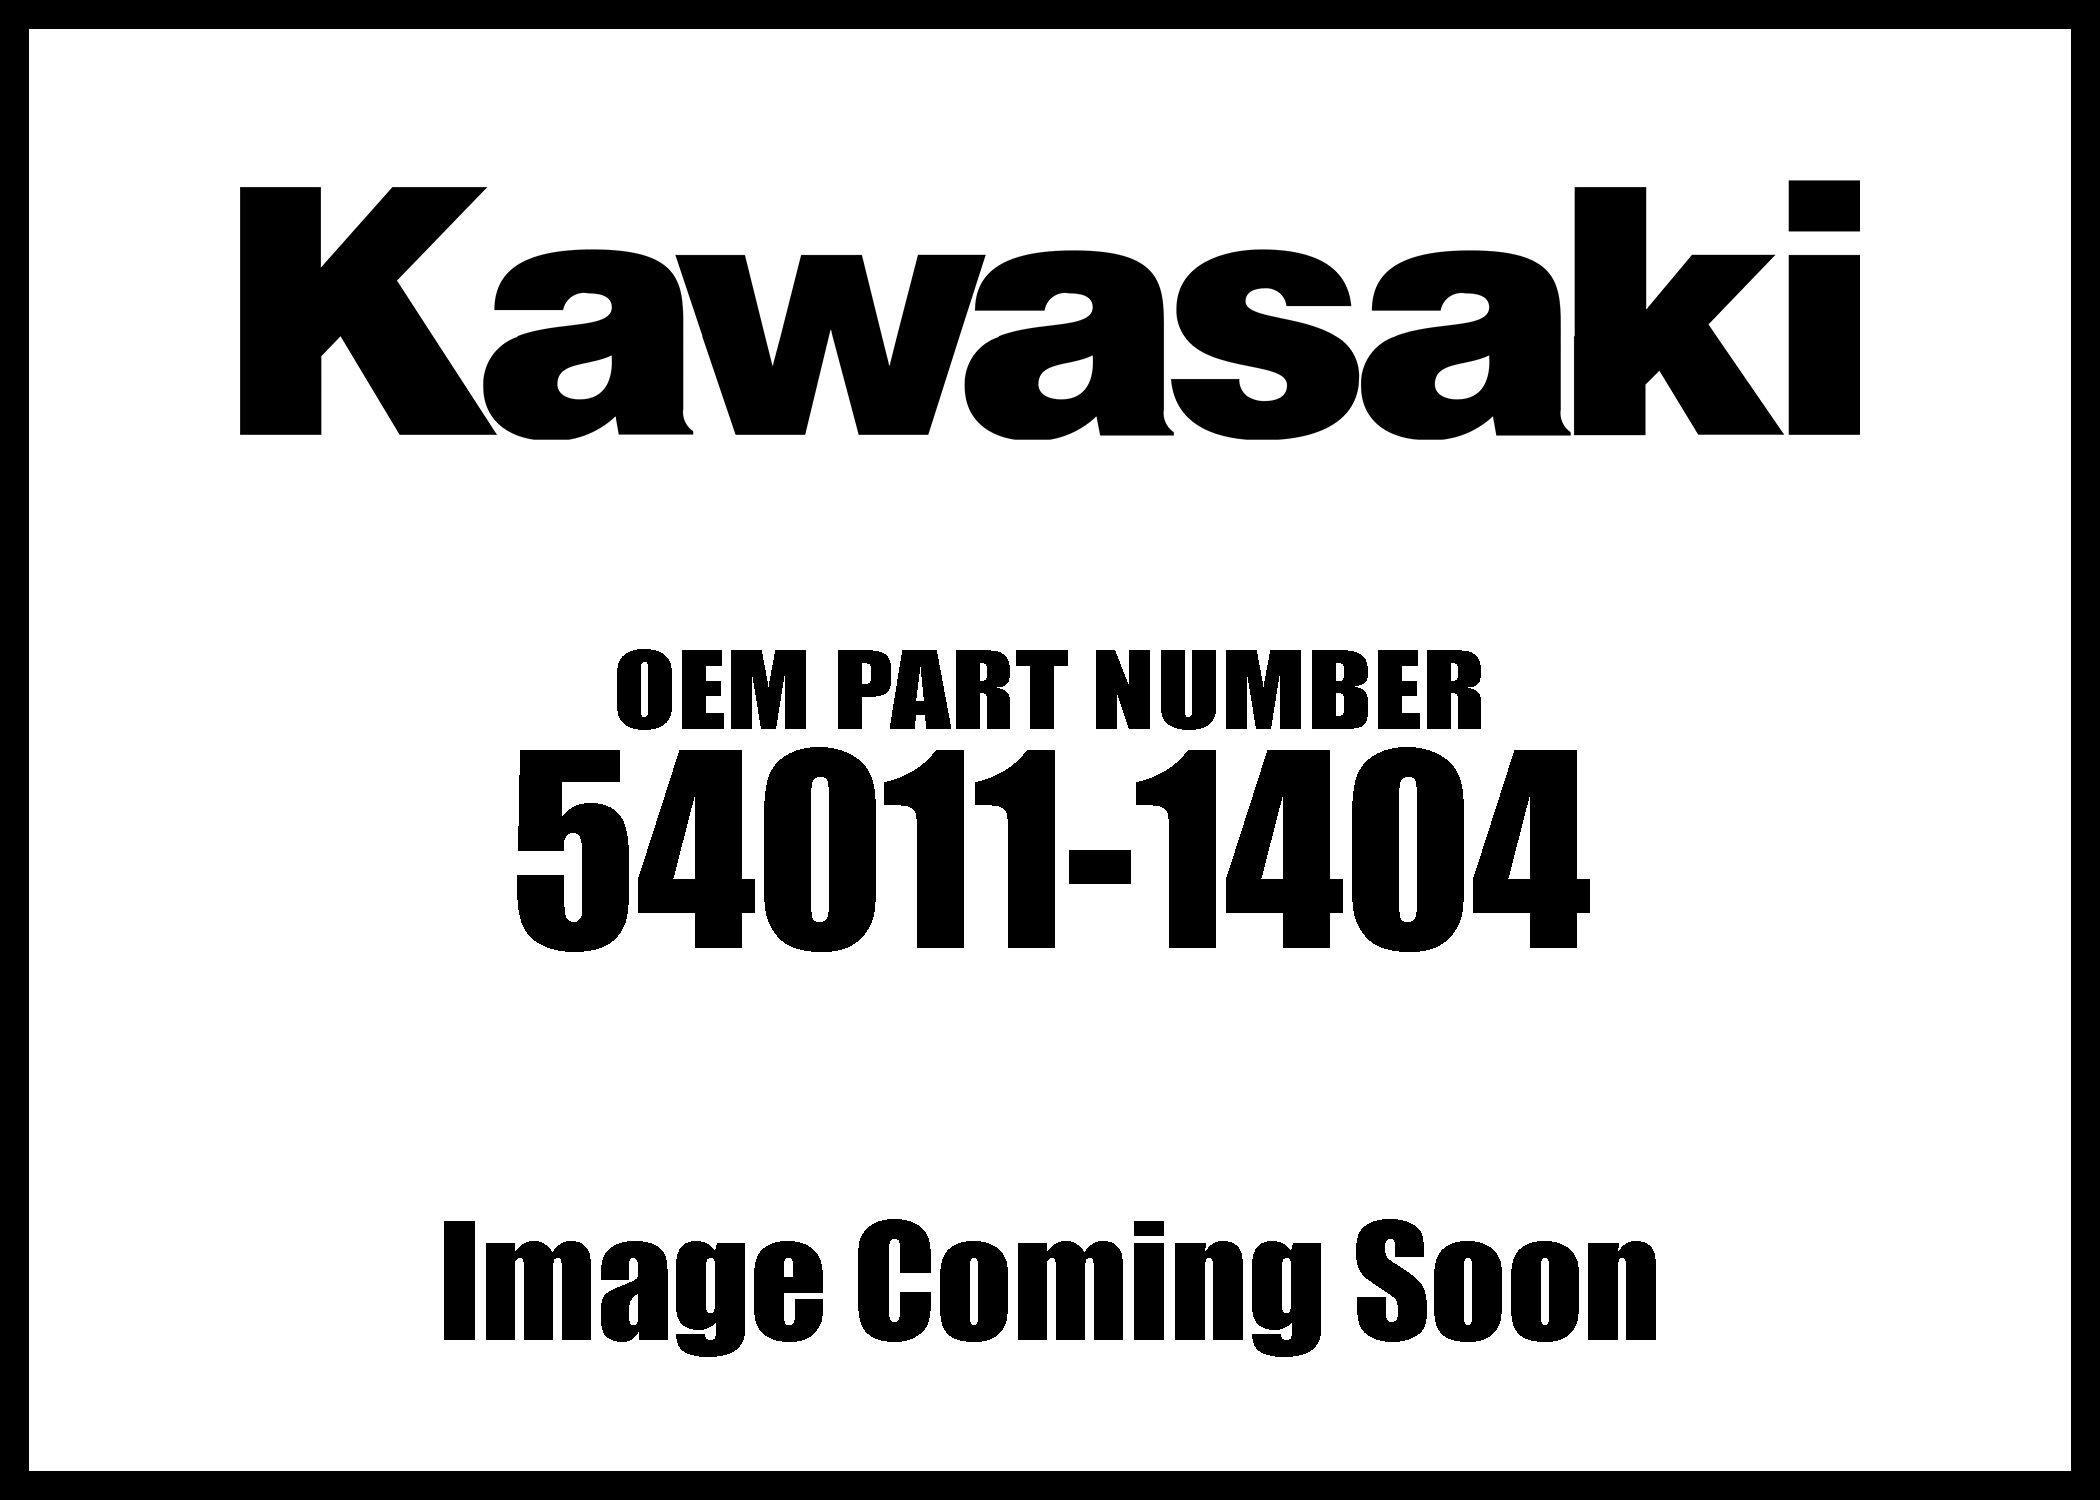 Kawasaki 2001-2009 Eliminator 125 Clutch Cable 54011-1404 New Oem by Kawasaki (Image #1)